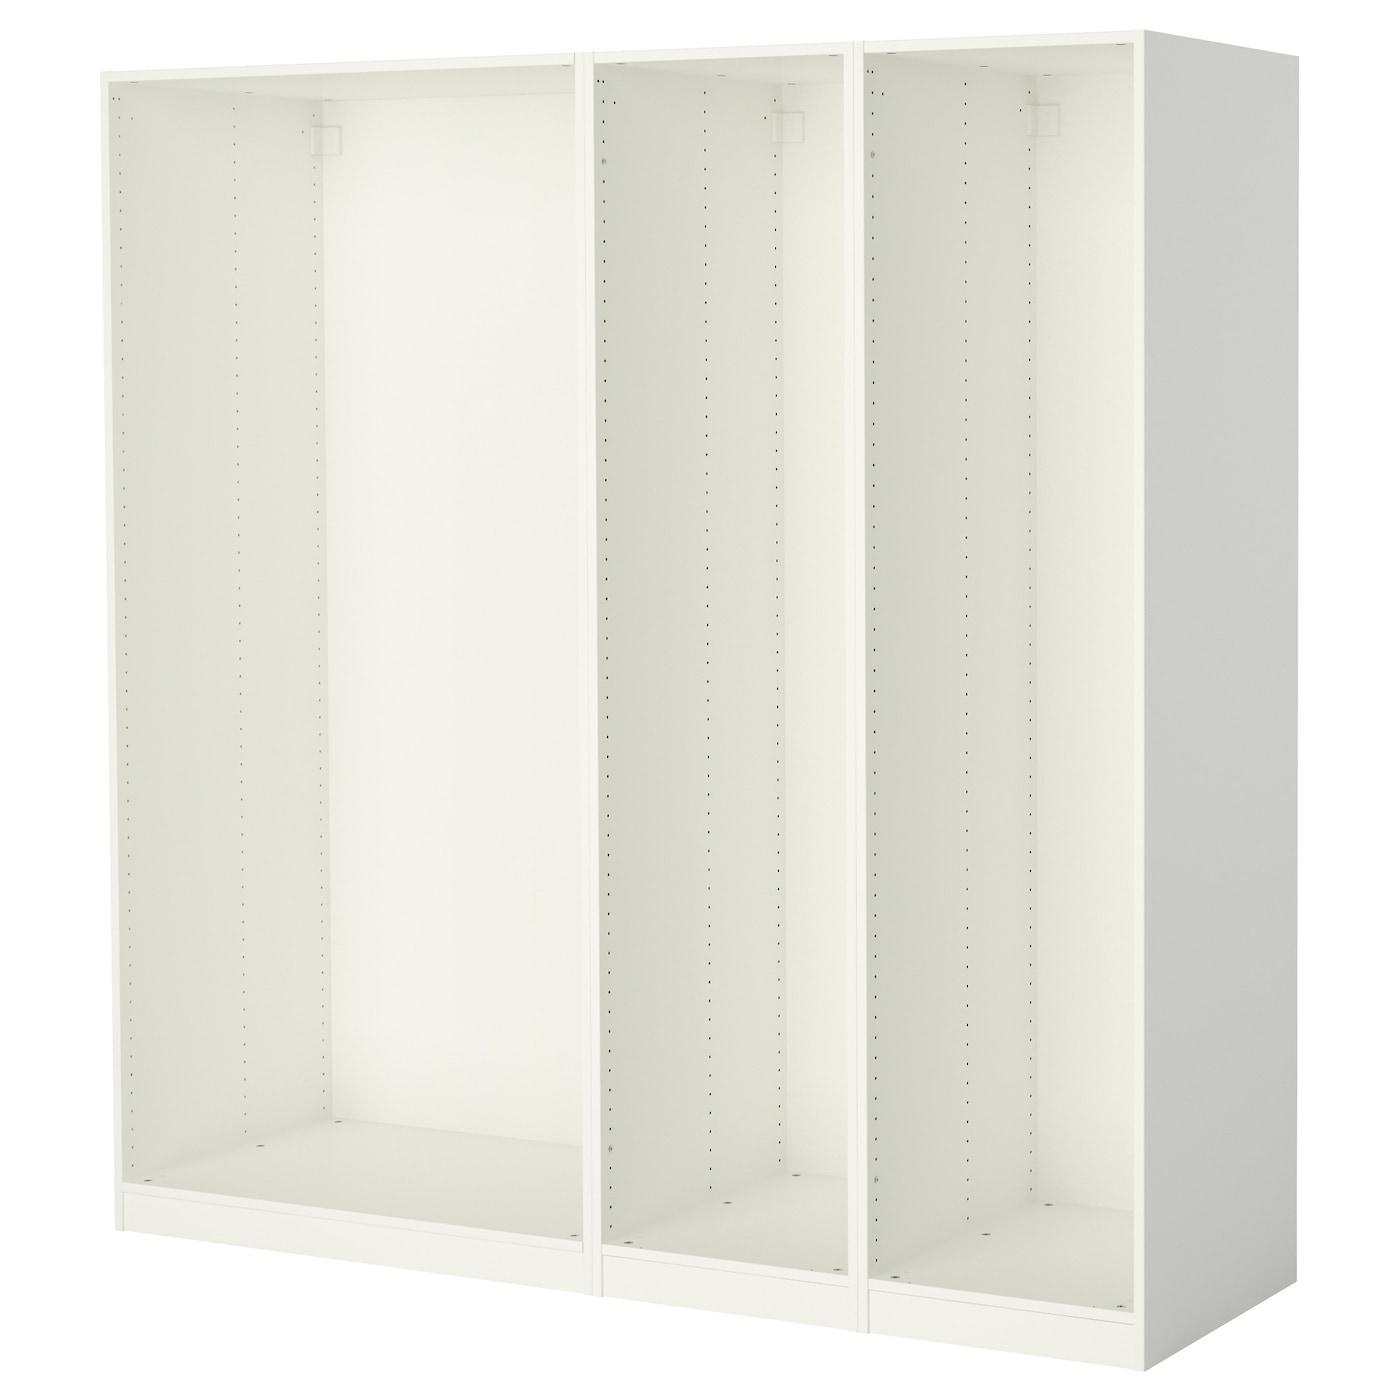 pax 3 caissons armoire blanc 200 x 58 x 201 cm ikea. Black Bedroom Furniture Sets. Home Design Ideas